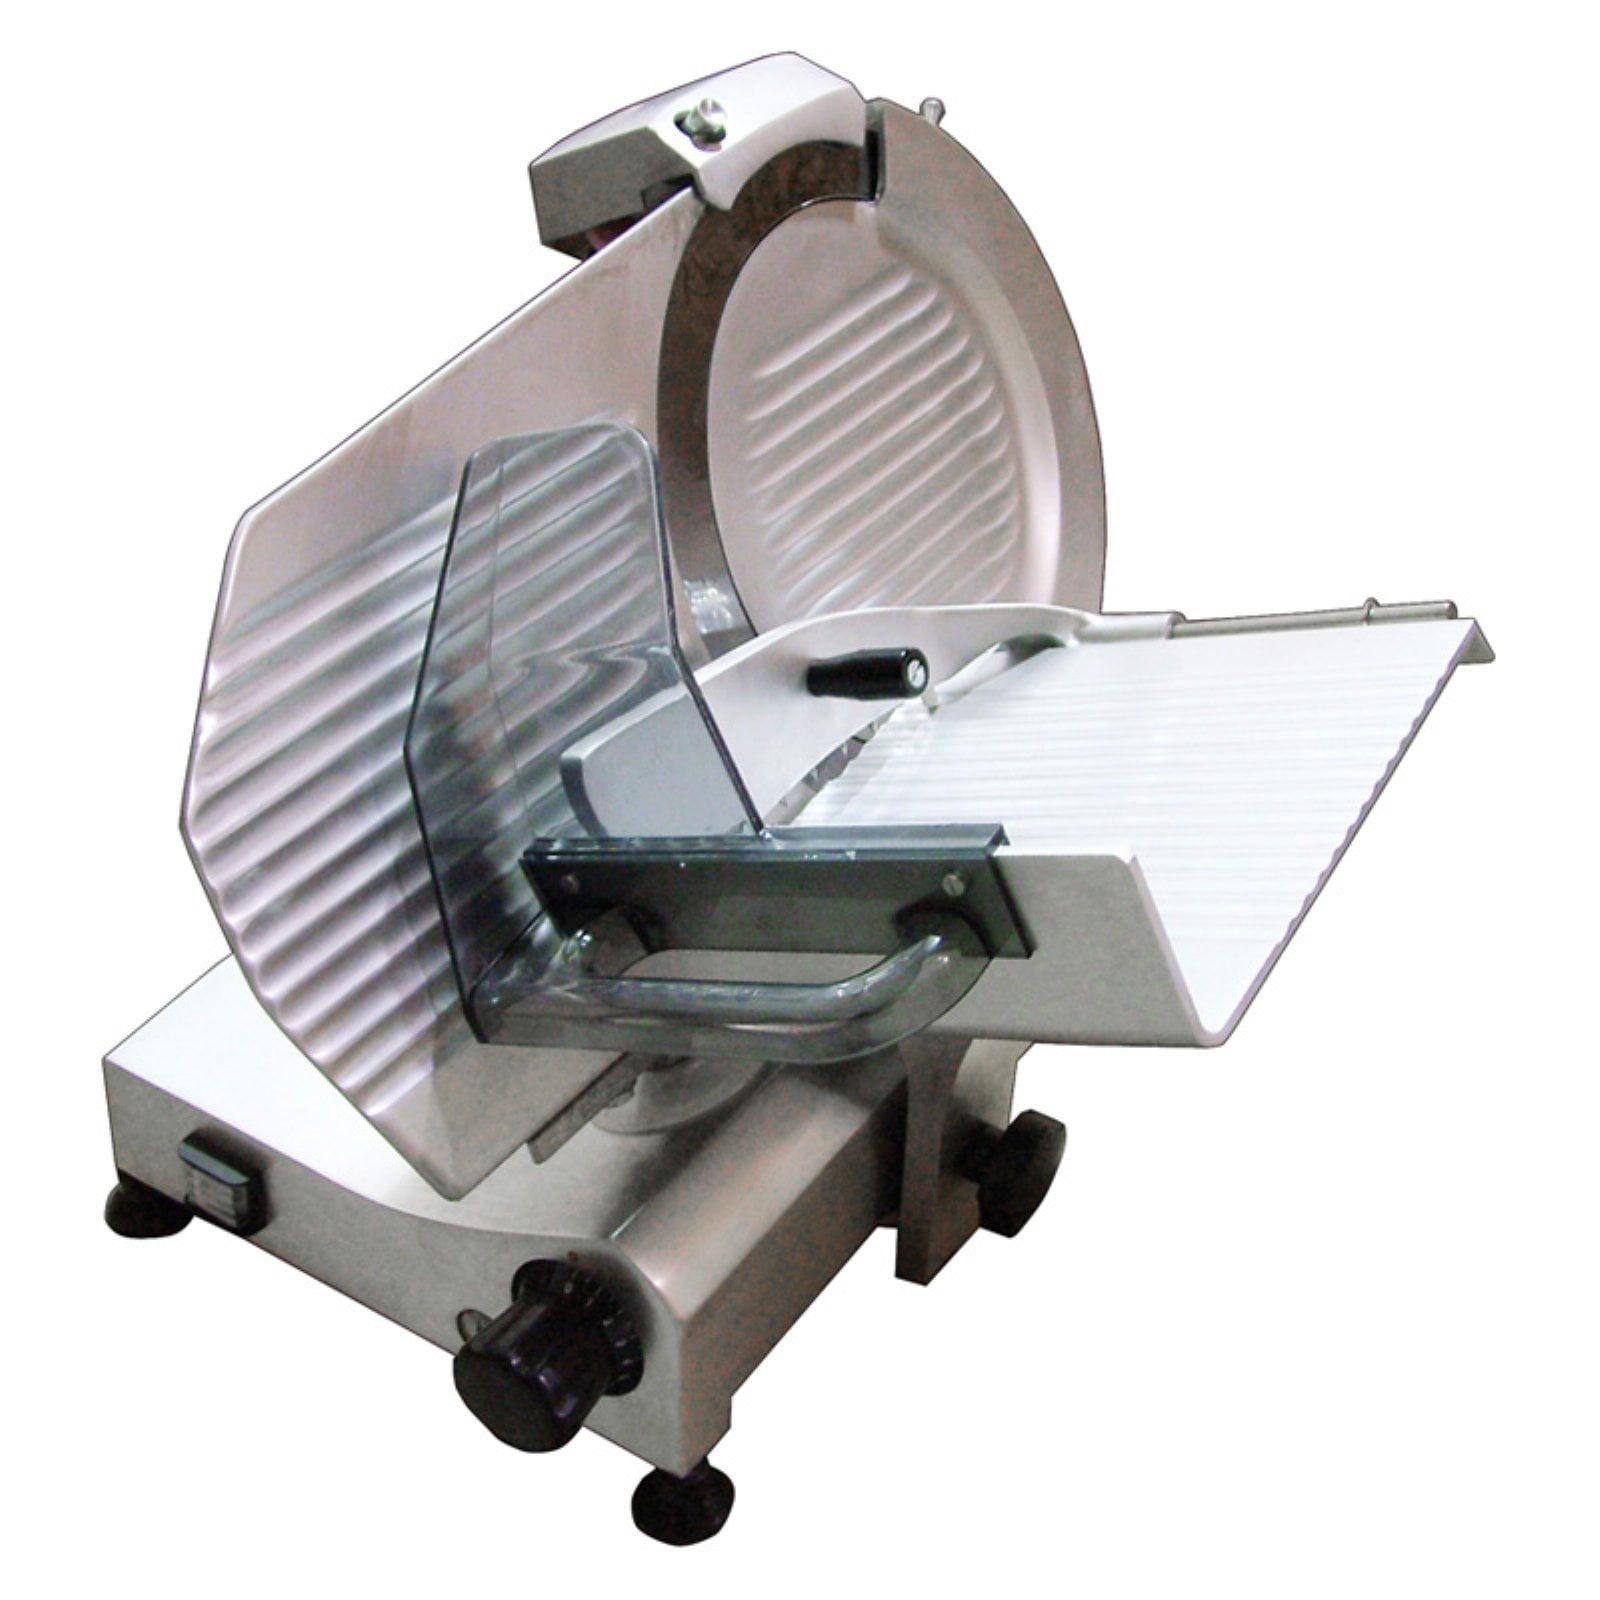 Omcan 275E 11 in. Commercial Food Slicer